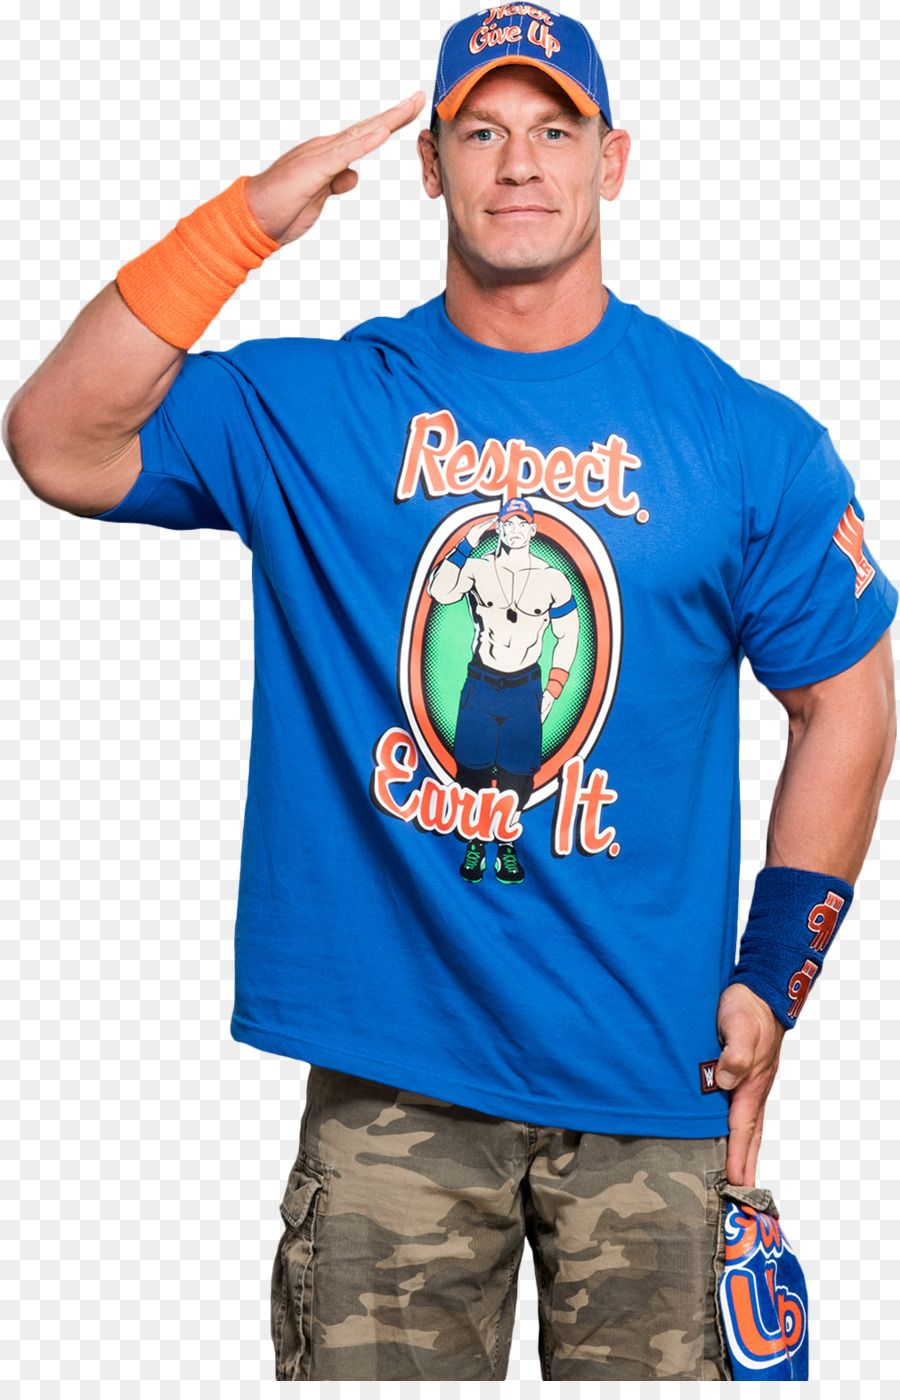 John Cena Wwe Championship Royal Rumble Wwe United States Championship Wrestlemania 33 John Cena 1011 1 John Cena Royal Rumble Wwe United States Championship